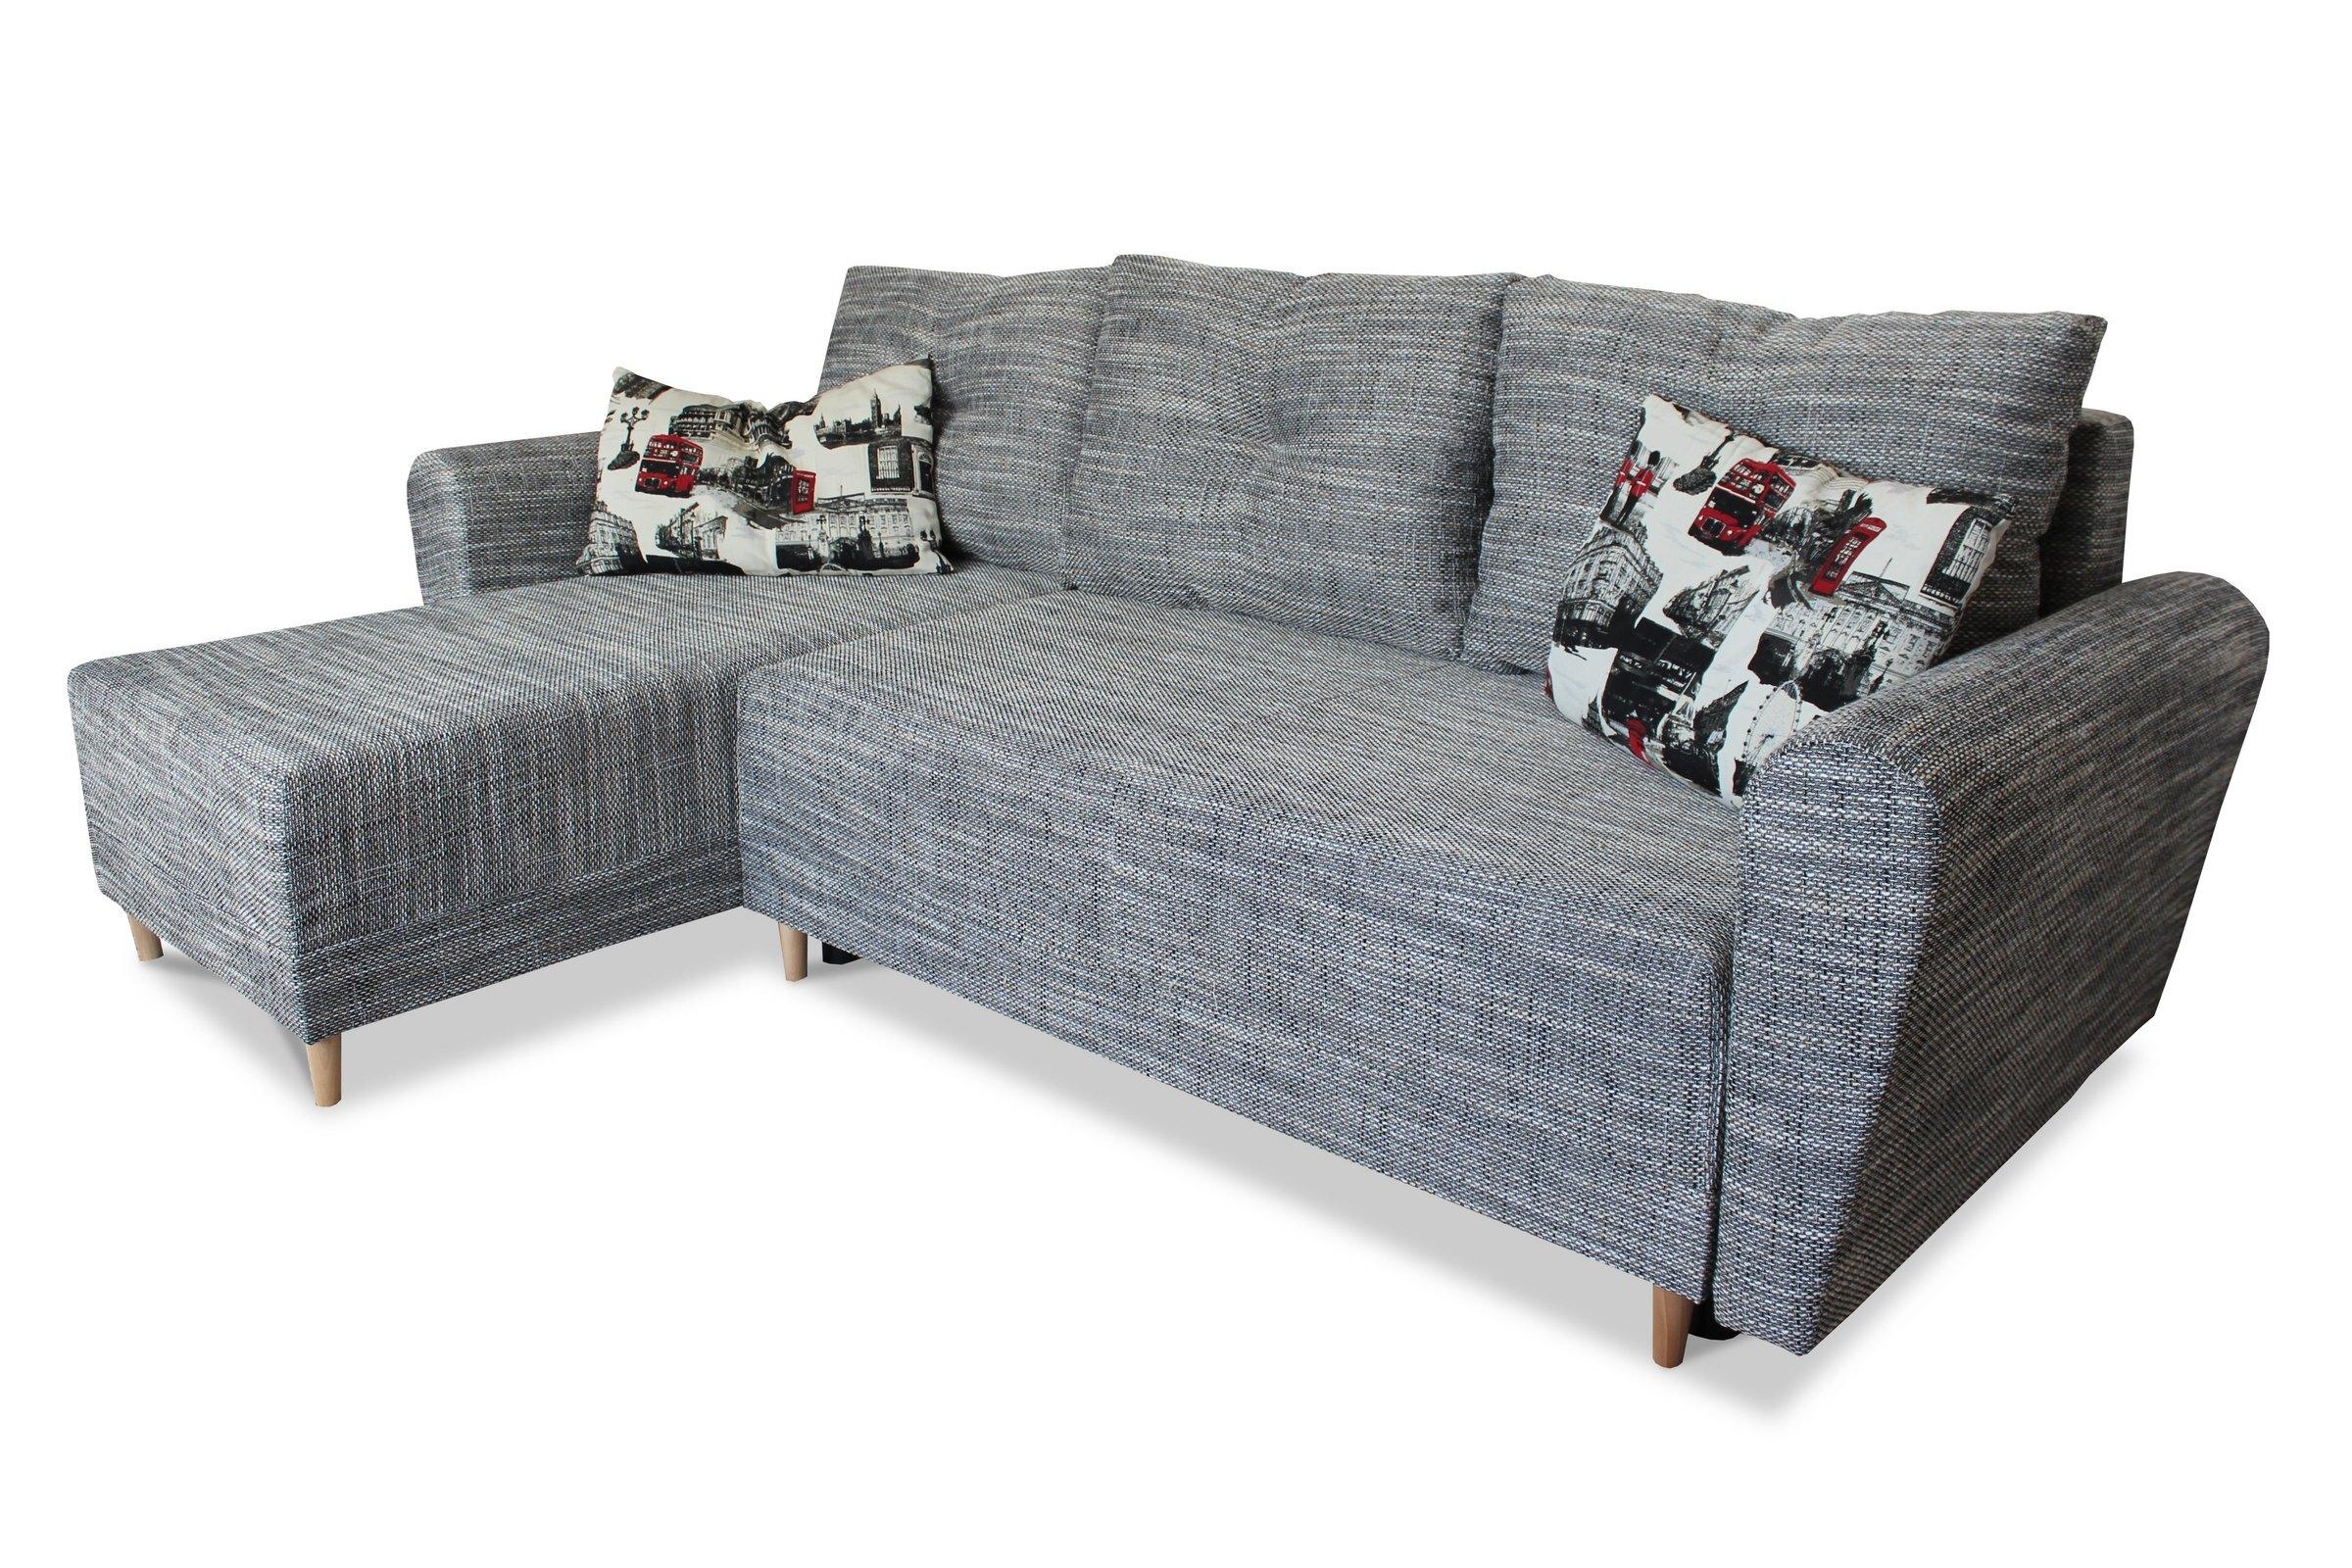 Corner Sofa Bed with Legs